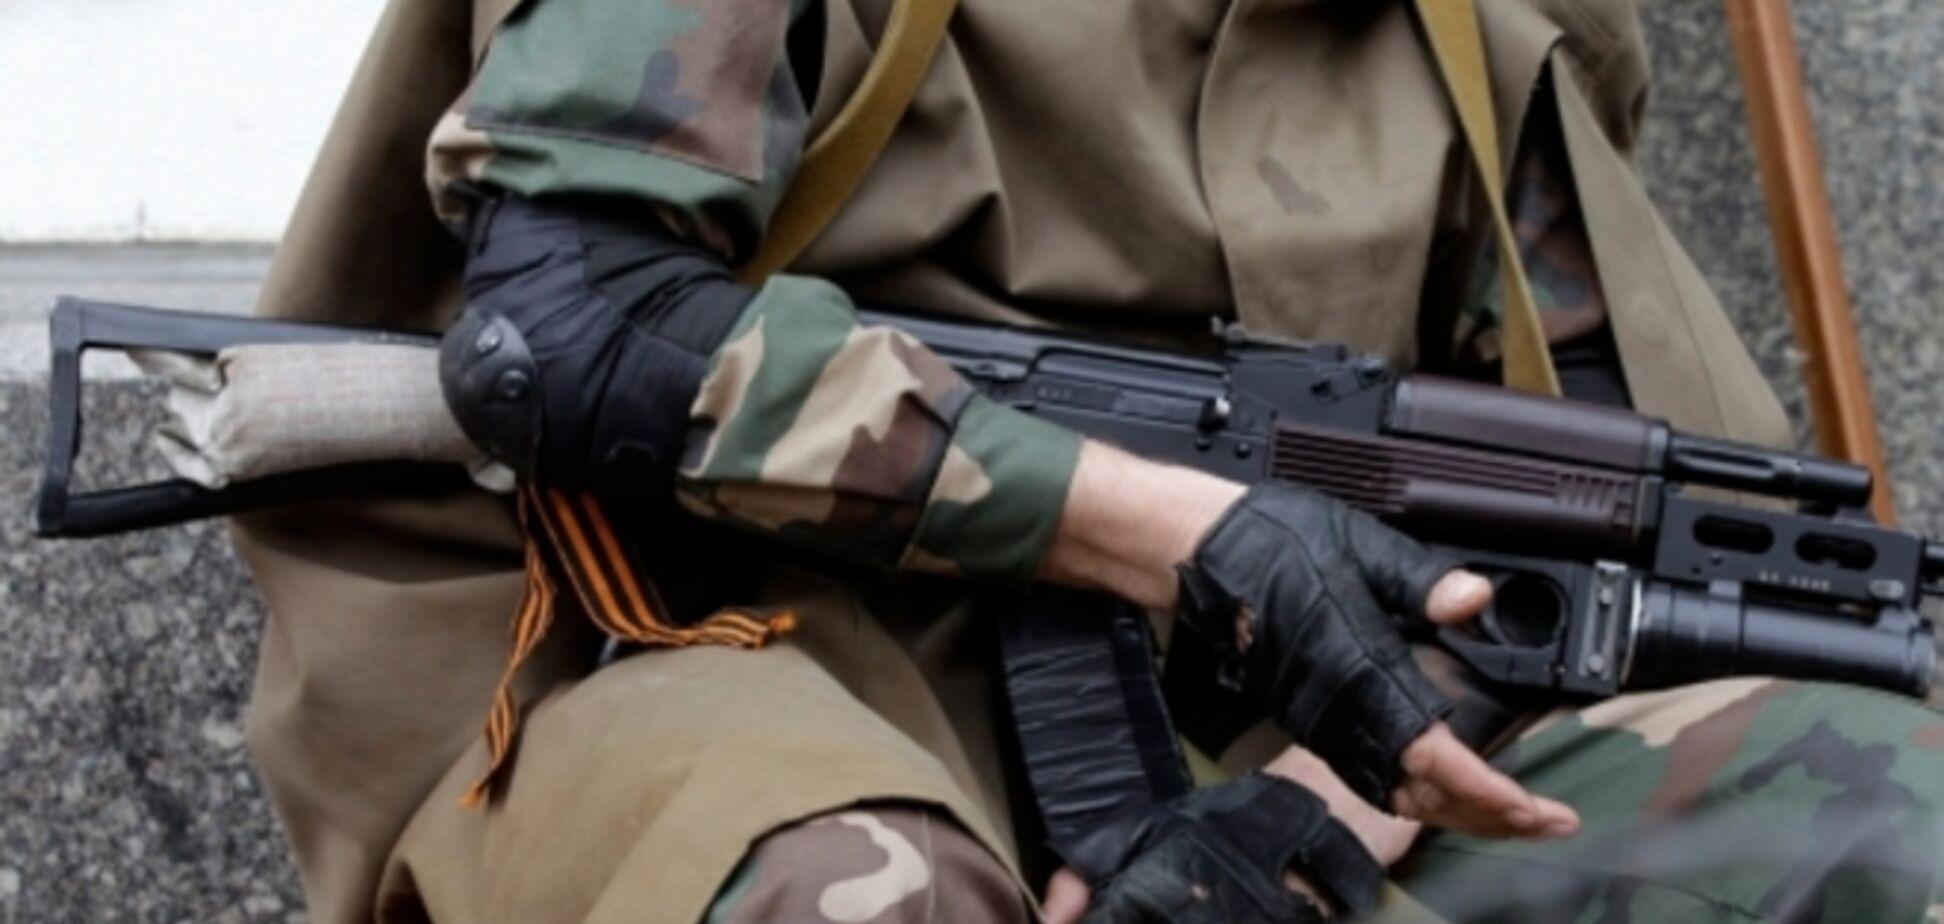 Террористы захватили 'Луганскгаз' и установили на крыше пулемет